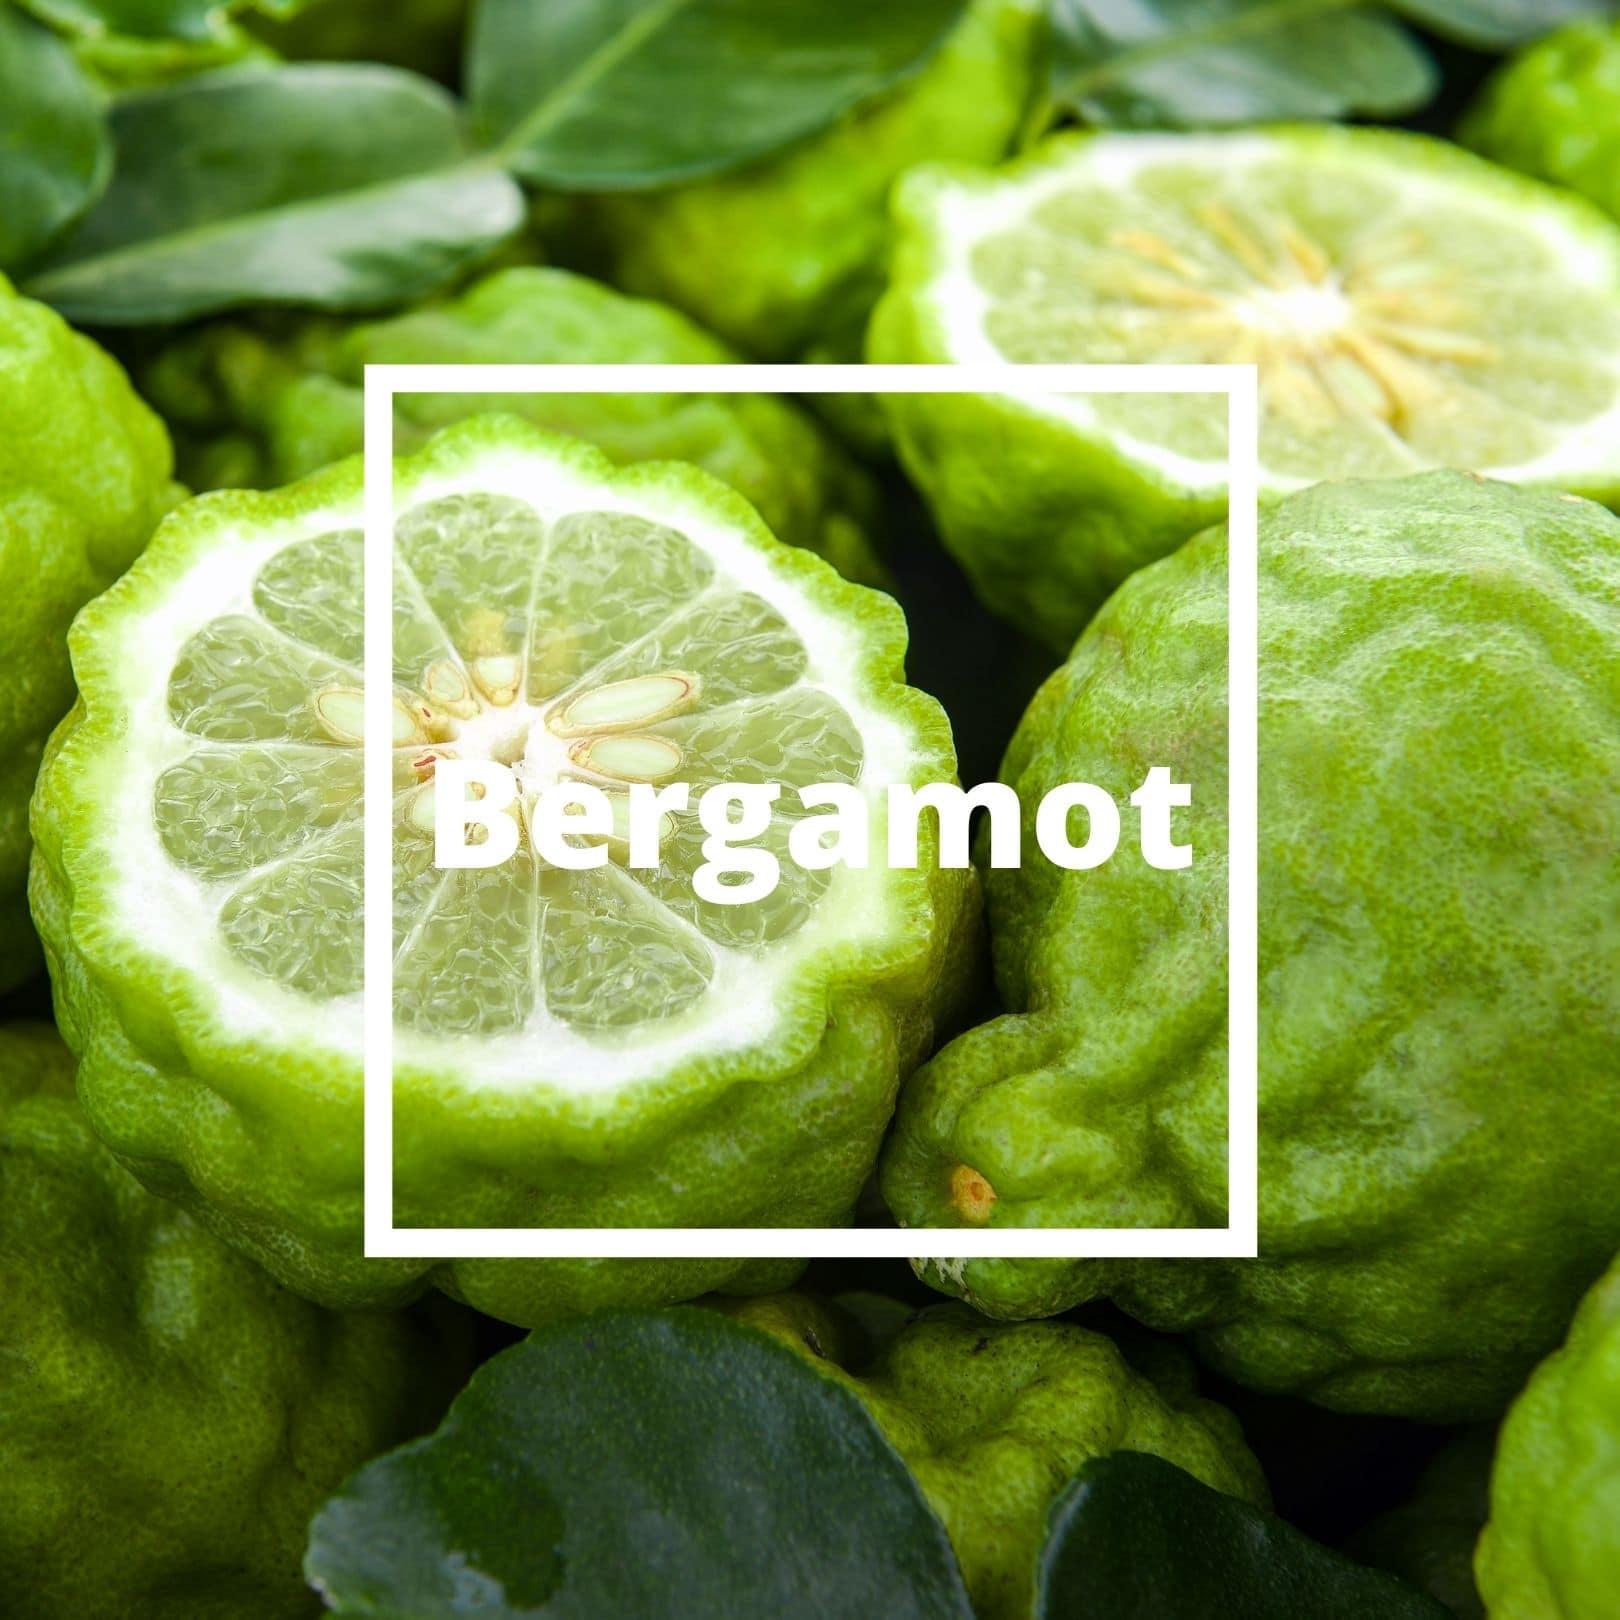 L'ATELIERO - Bergamot - Innocent Addiction